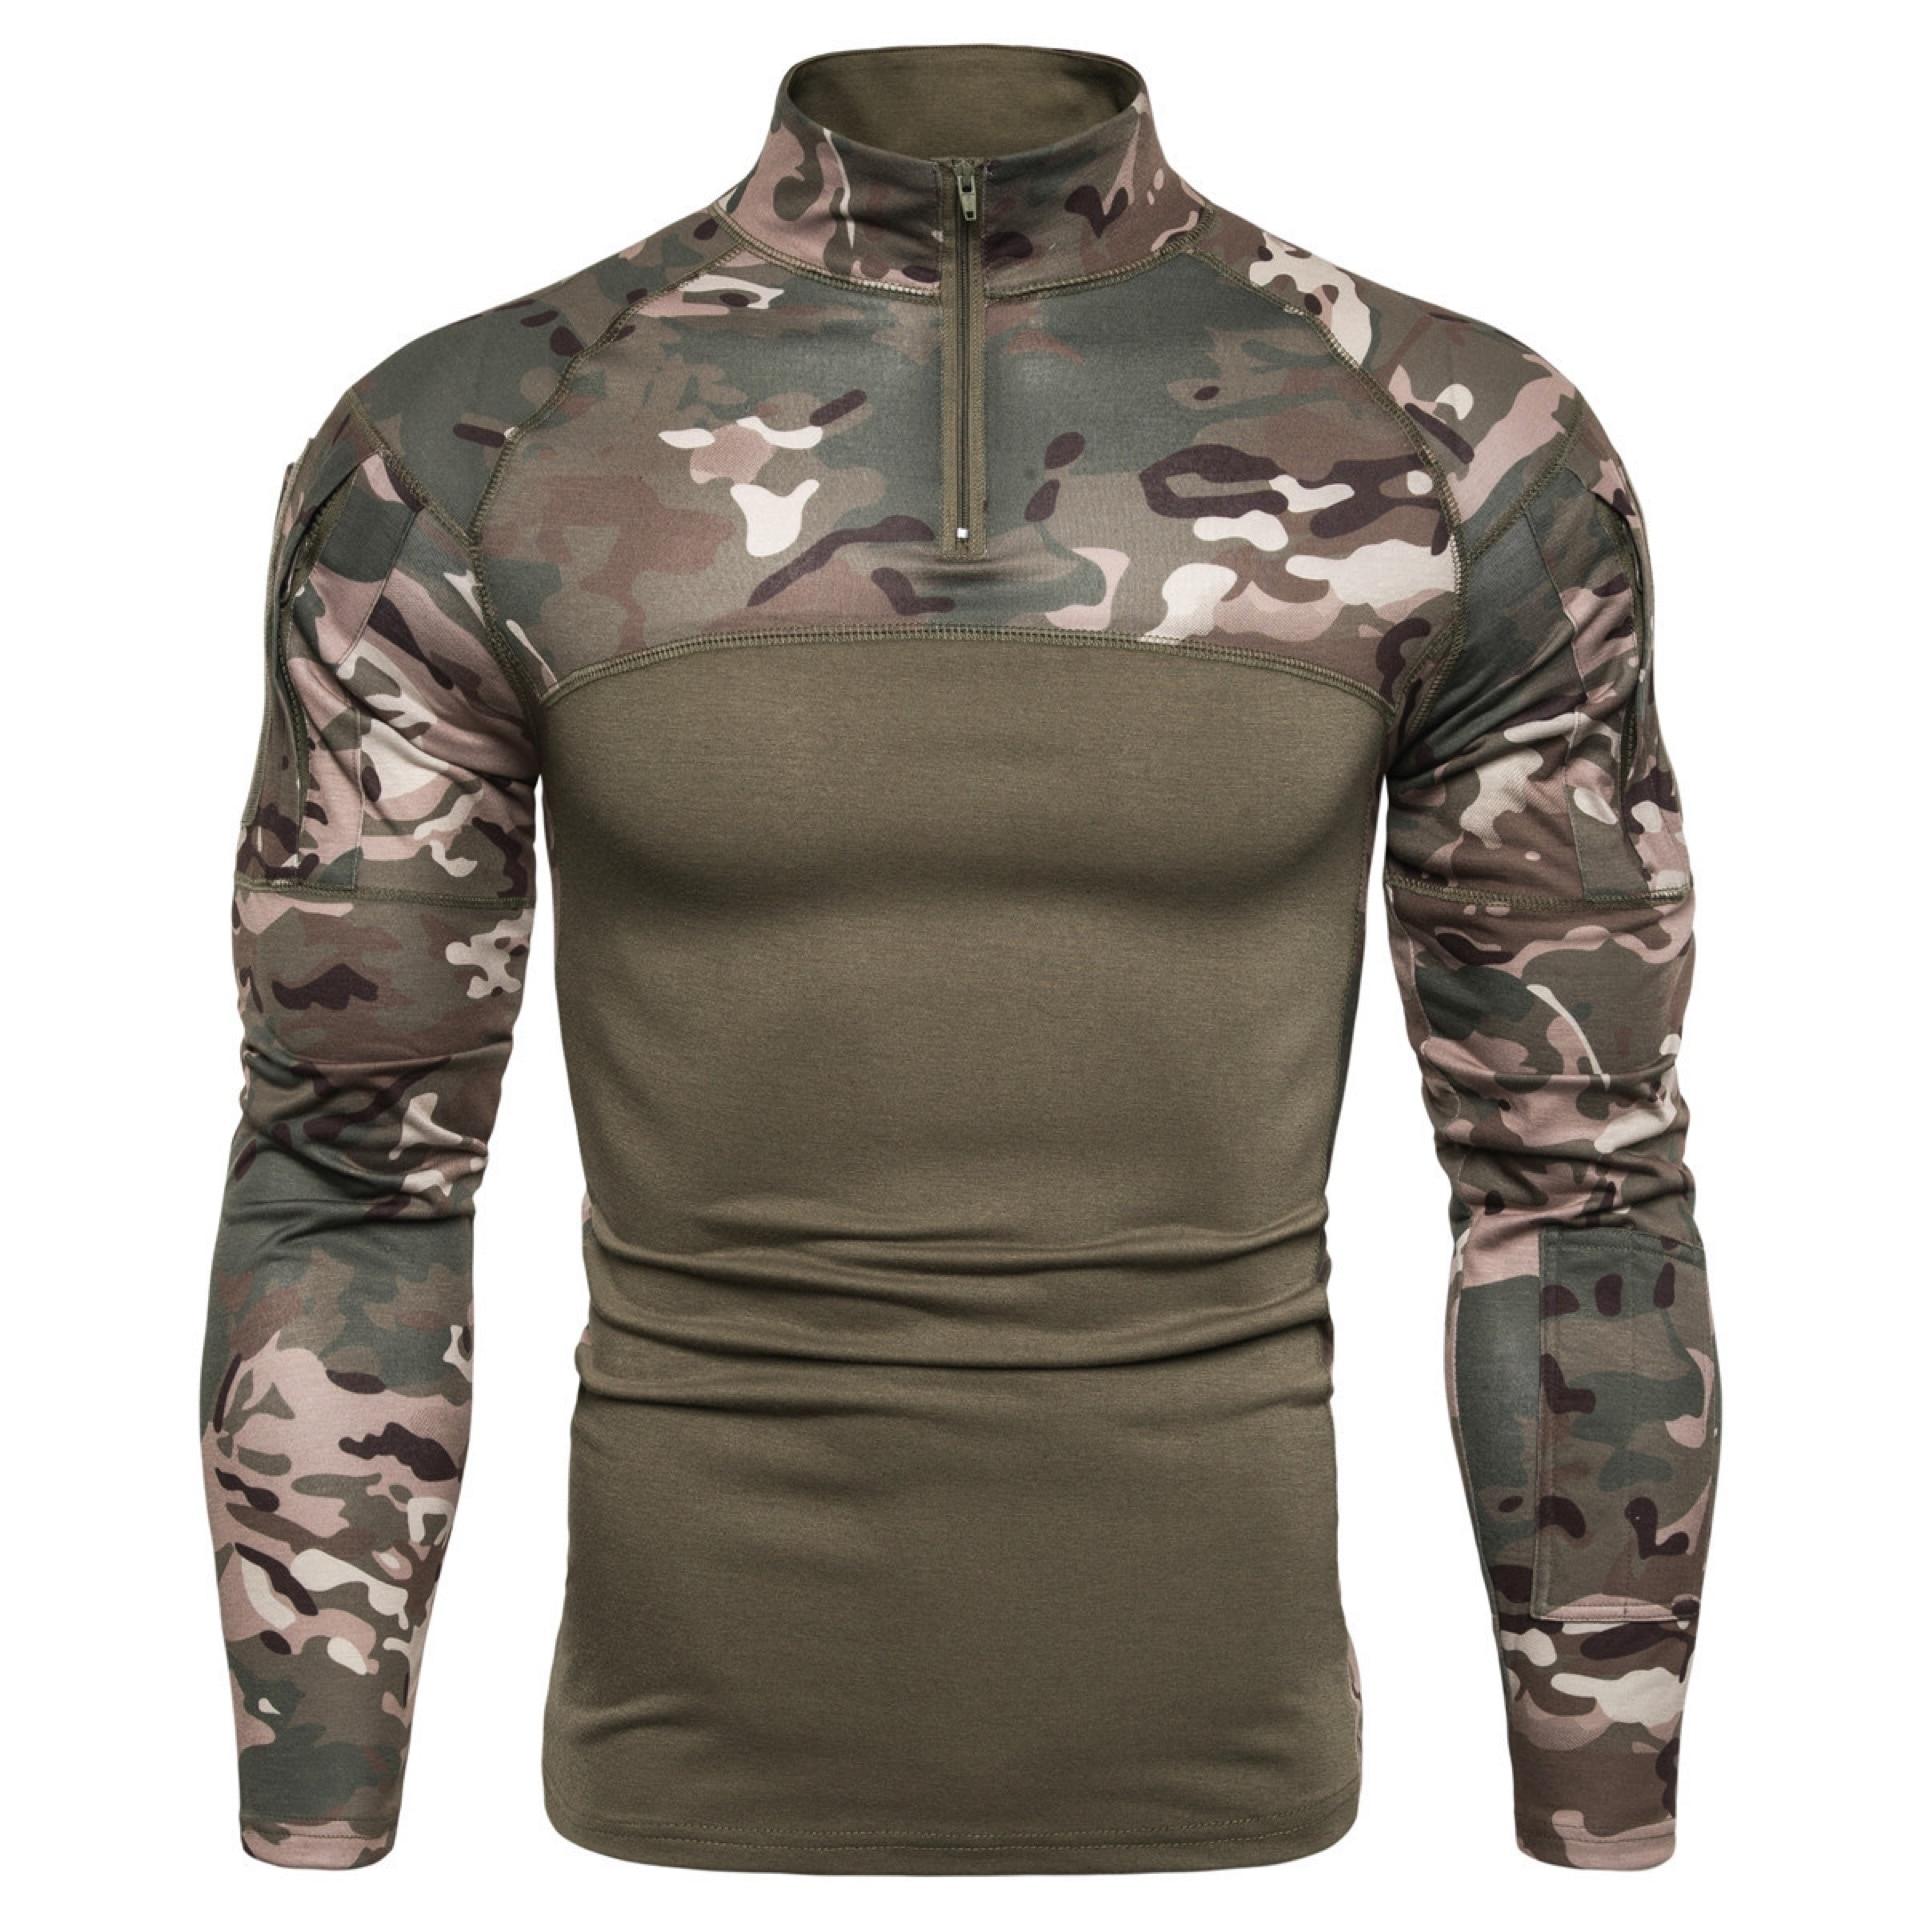 Mege camuflaje táctico militar ropa de combate camisa de asalto multicámara ACU manga larga ejército apretado camiseta ejército USMC traje